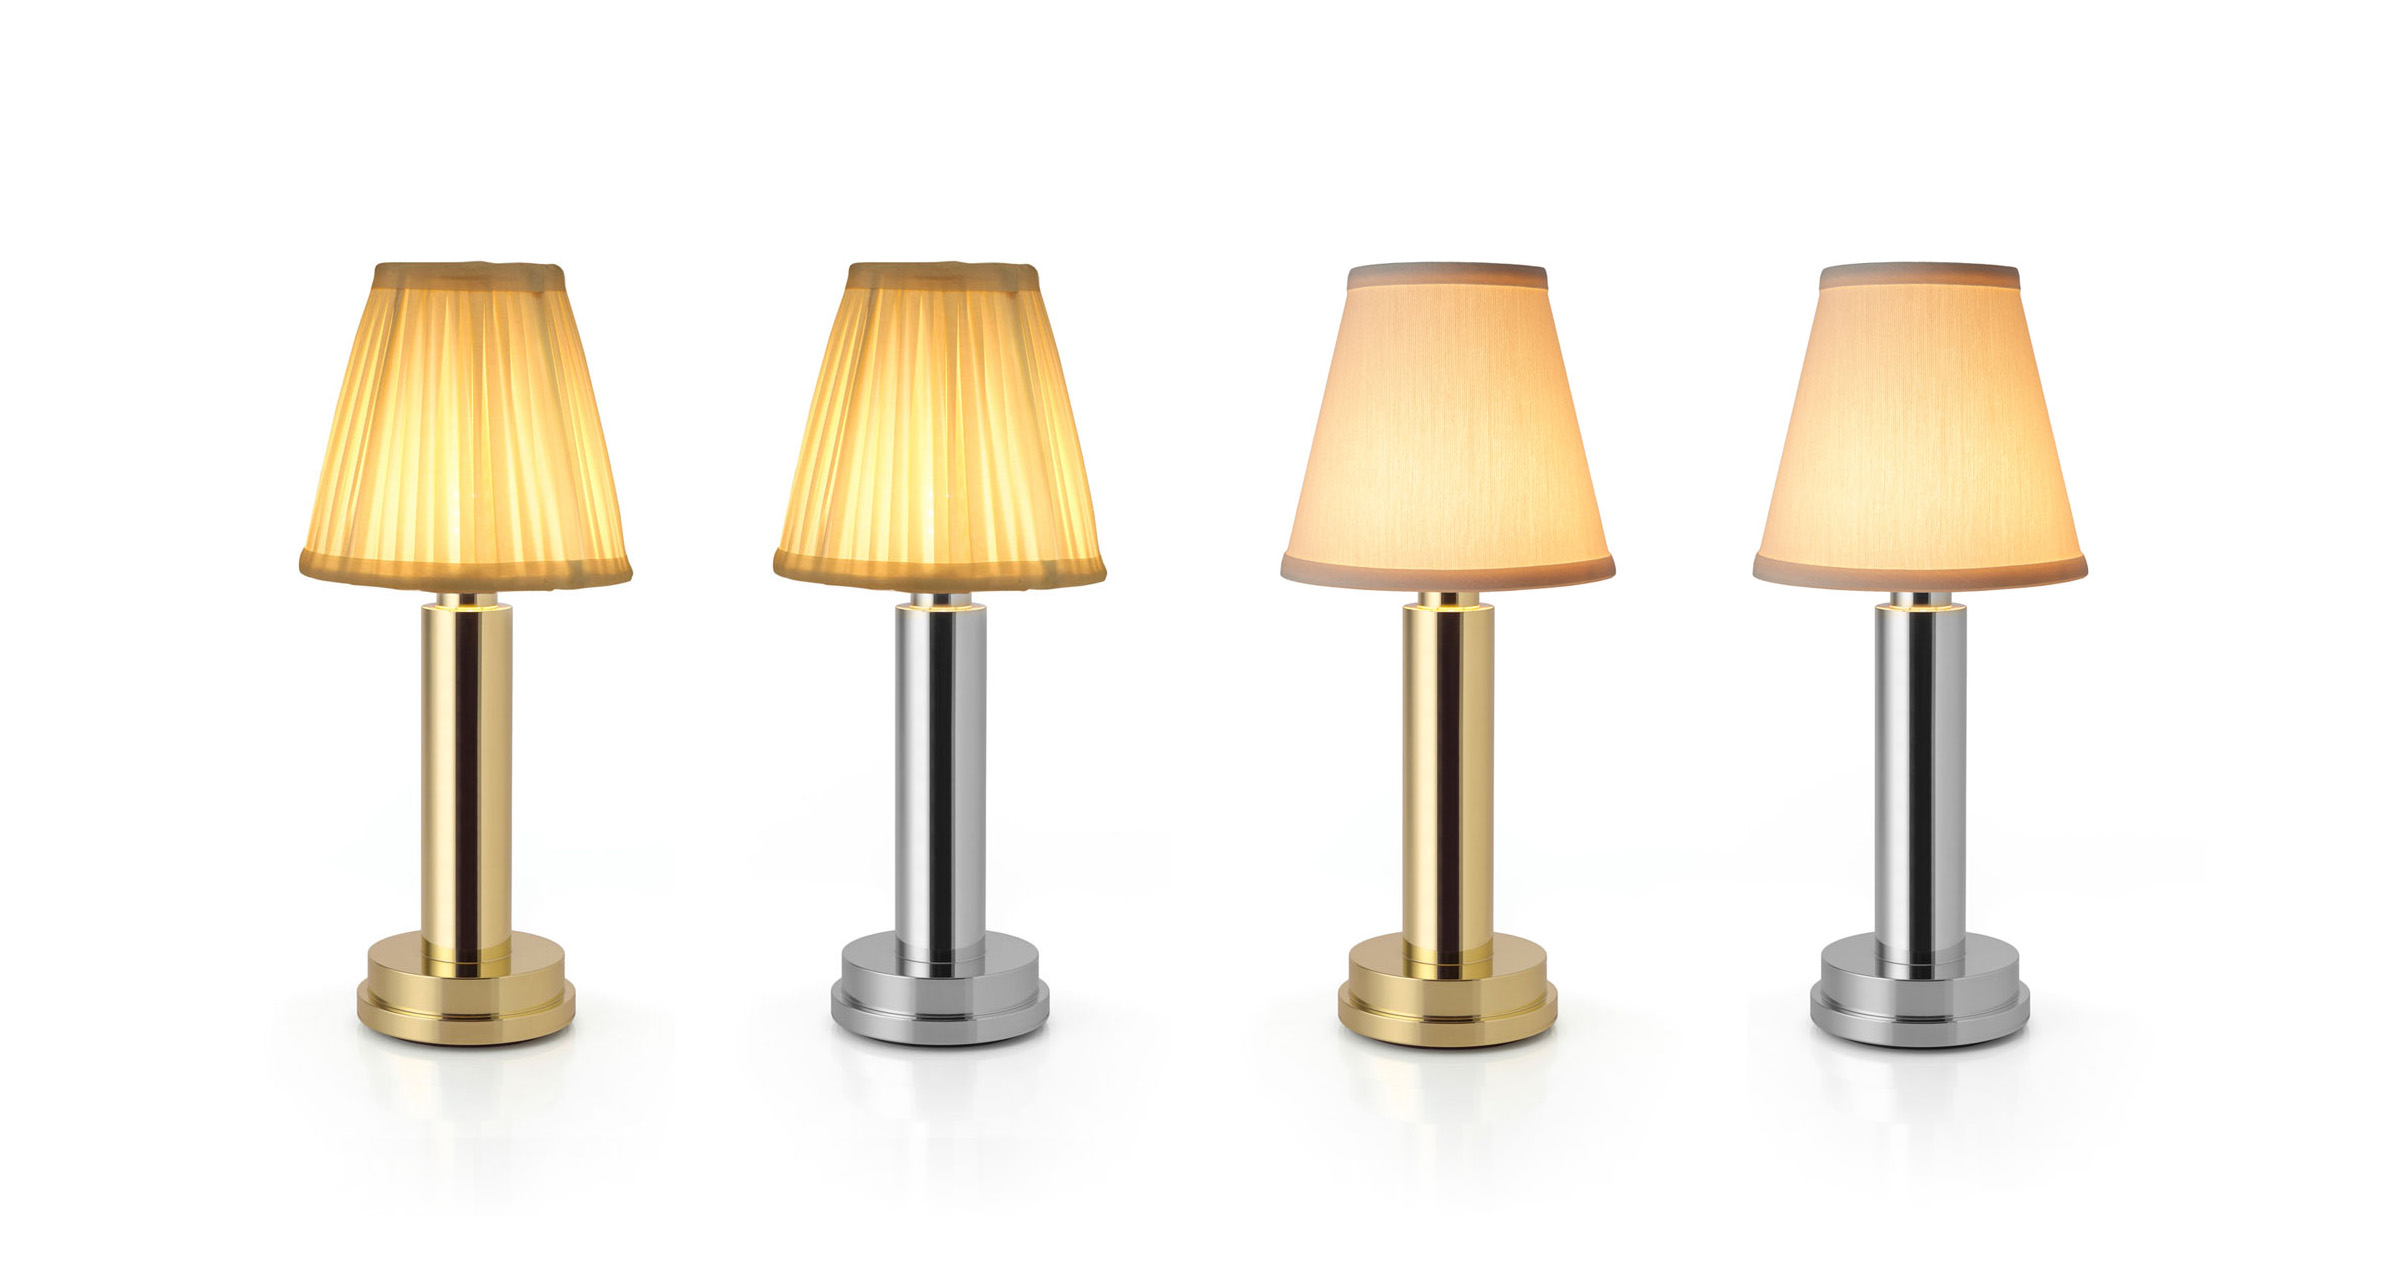 Victoria Cordless Lamp By Neoz Lighting Archello